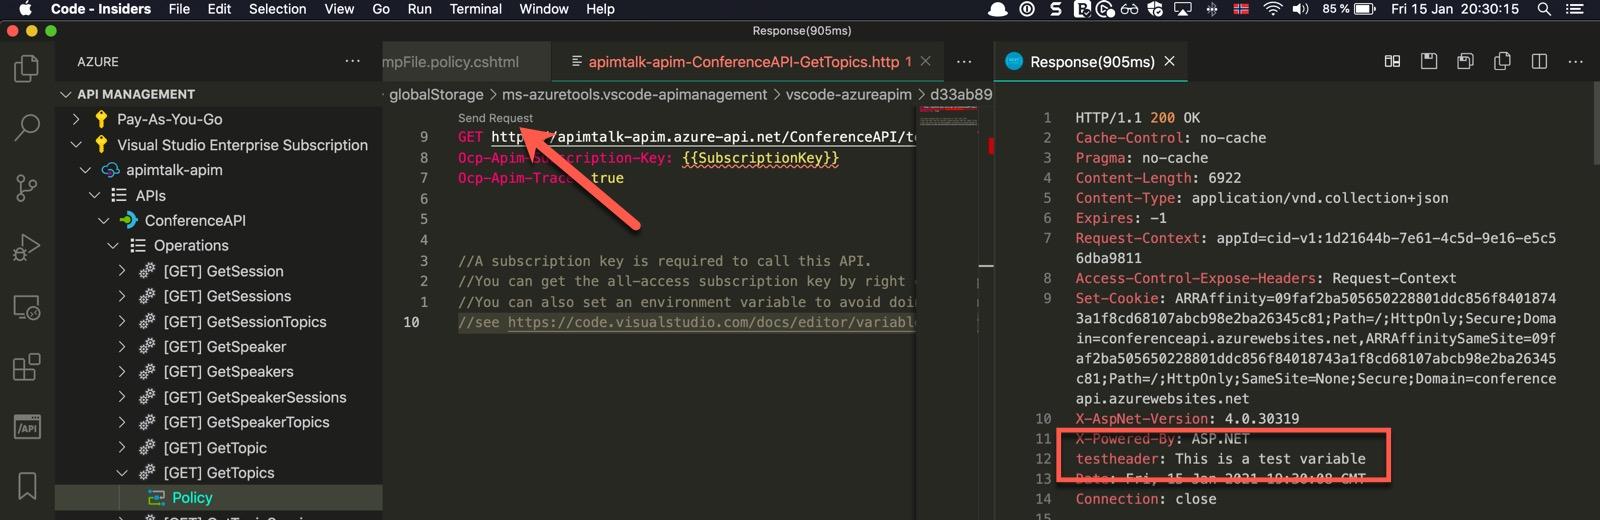 Testing API Operation Policy